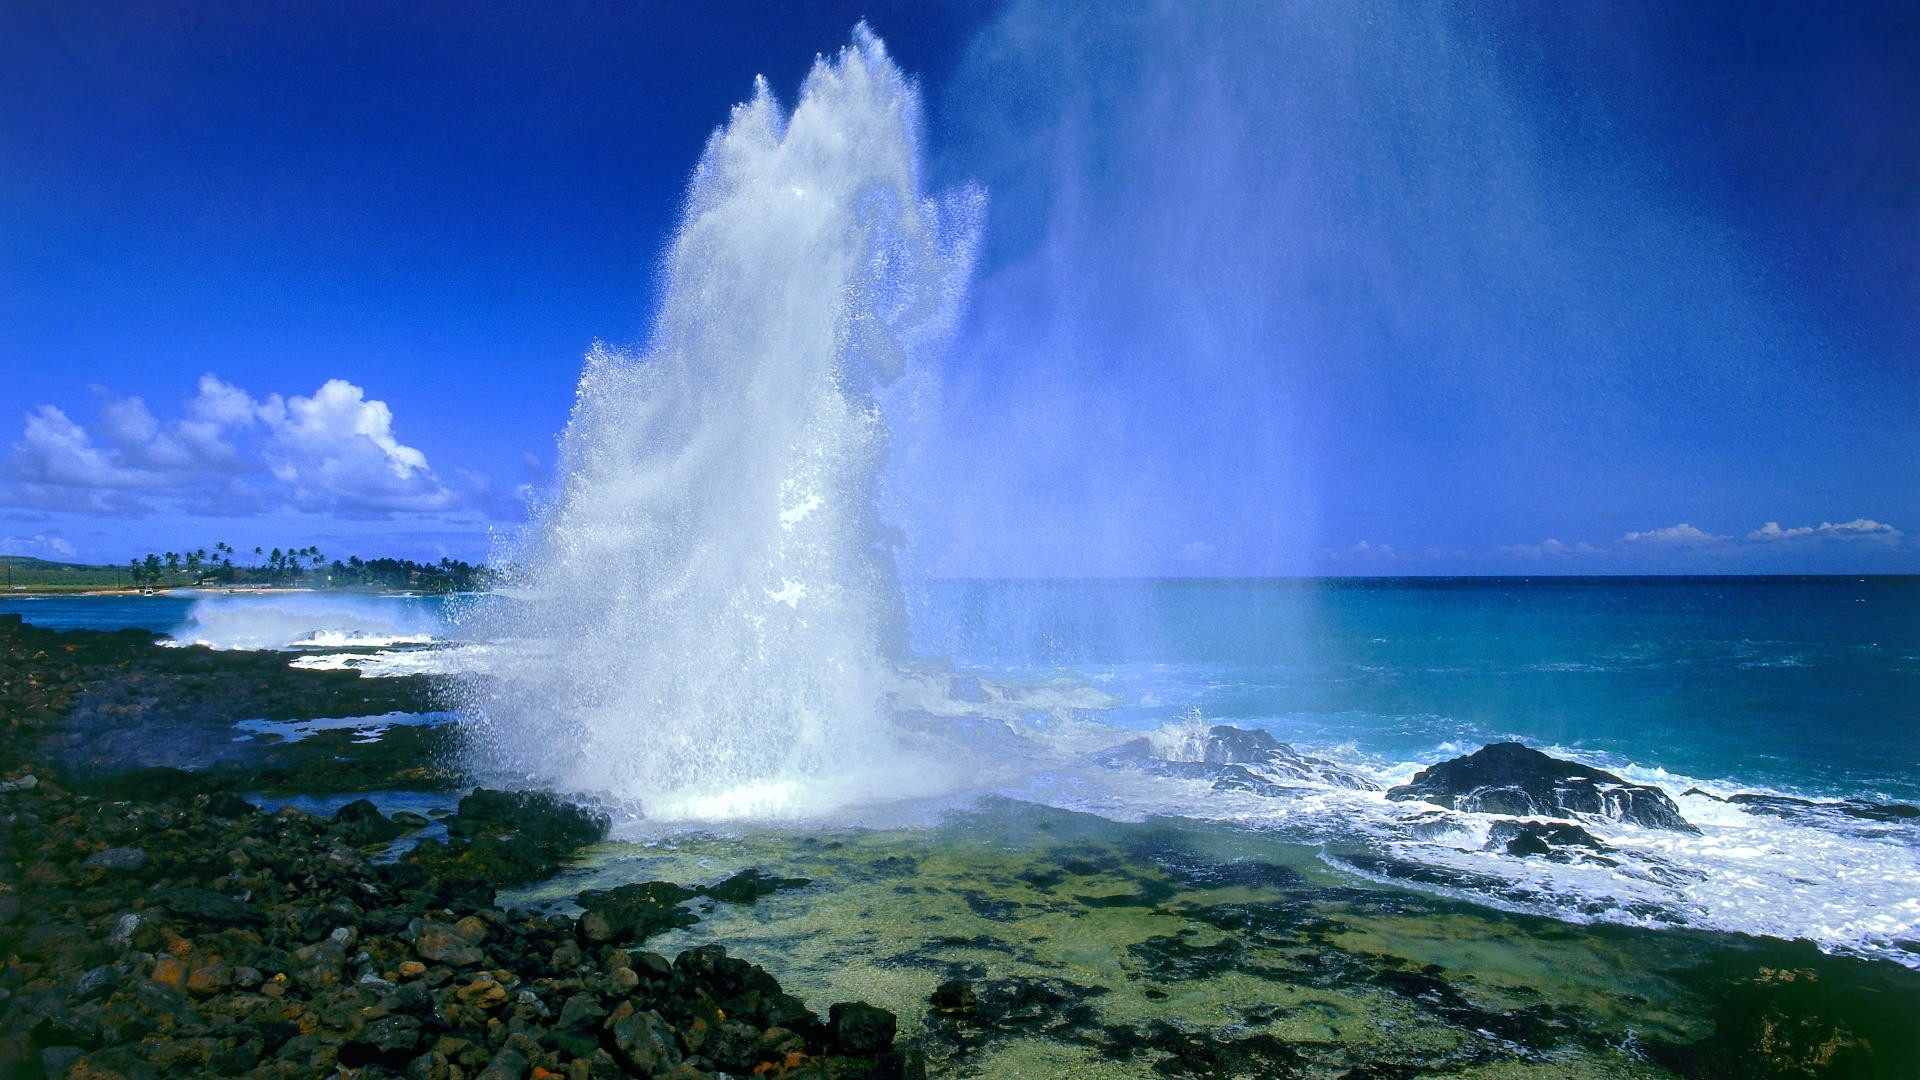 Kauai Pictures High Quality - HD Wallpaper